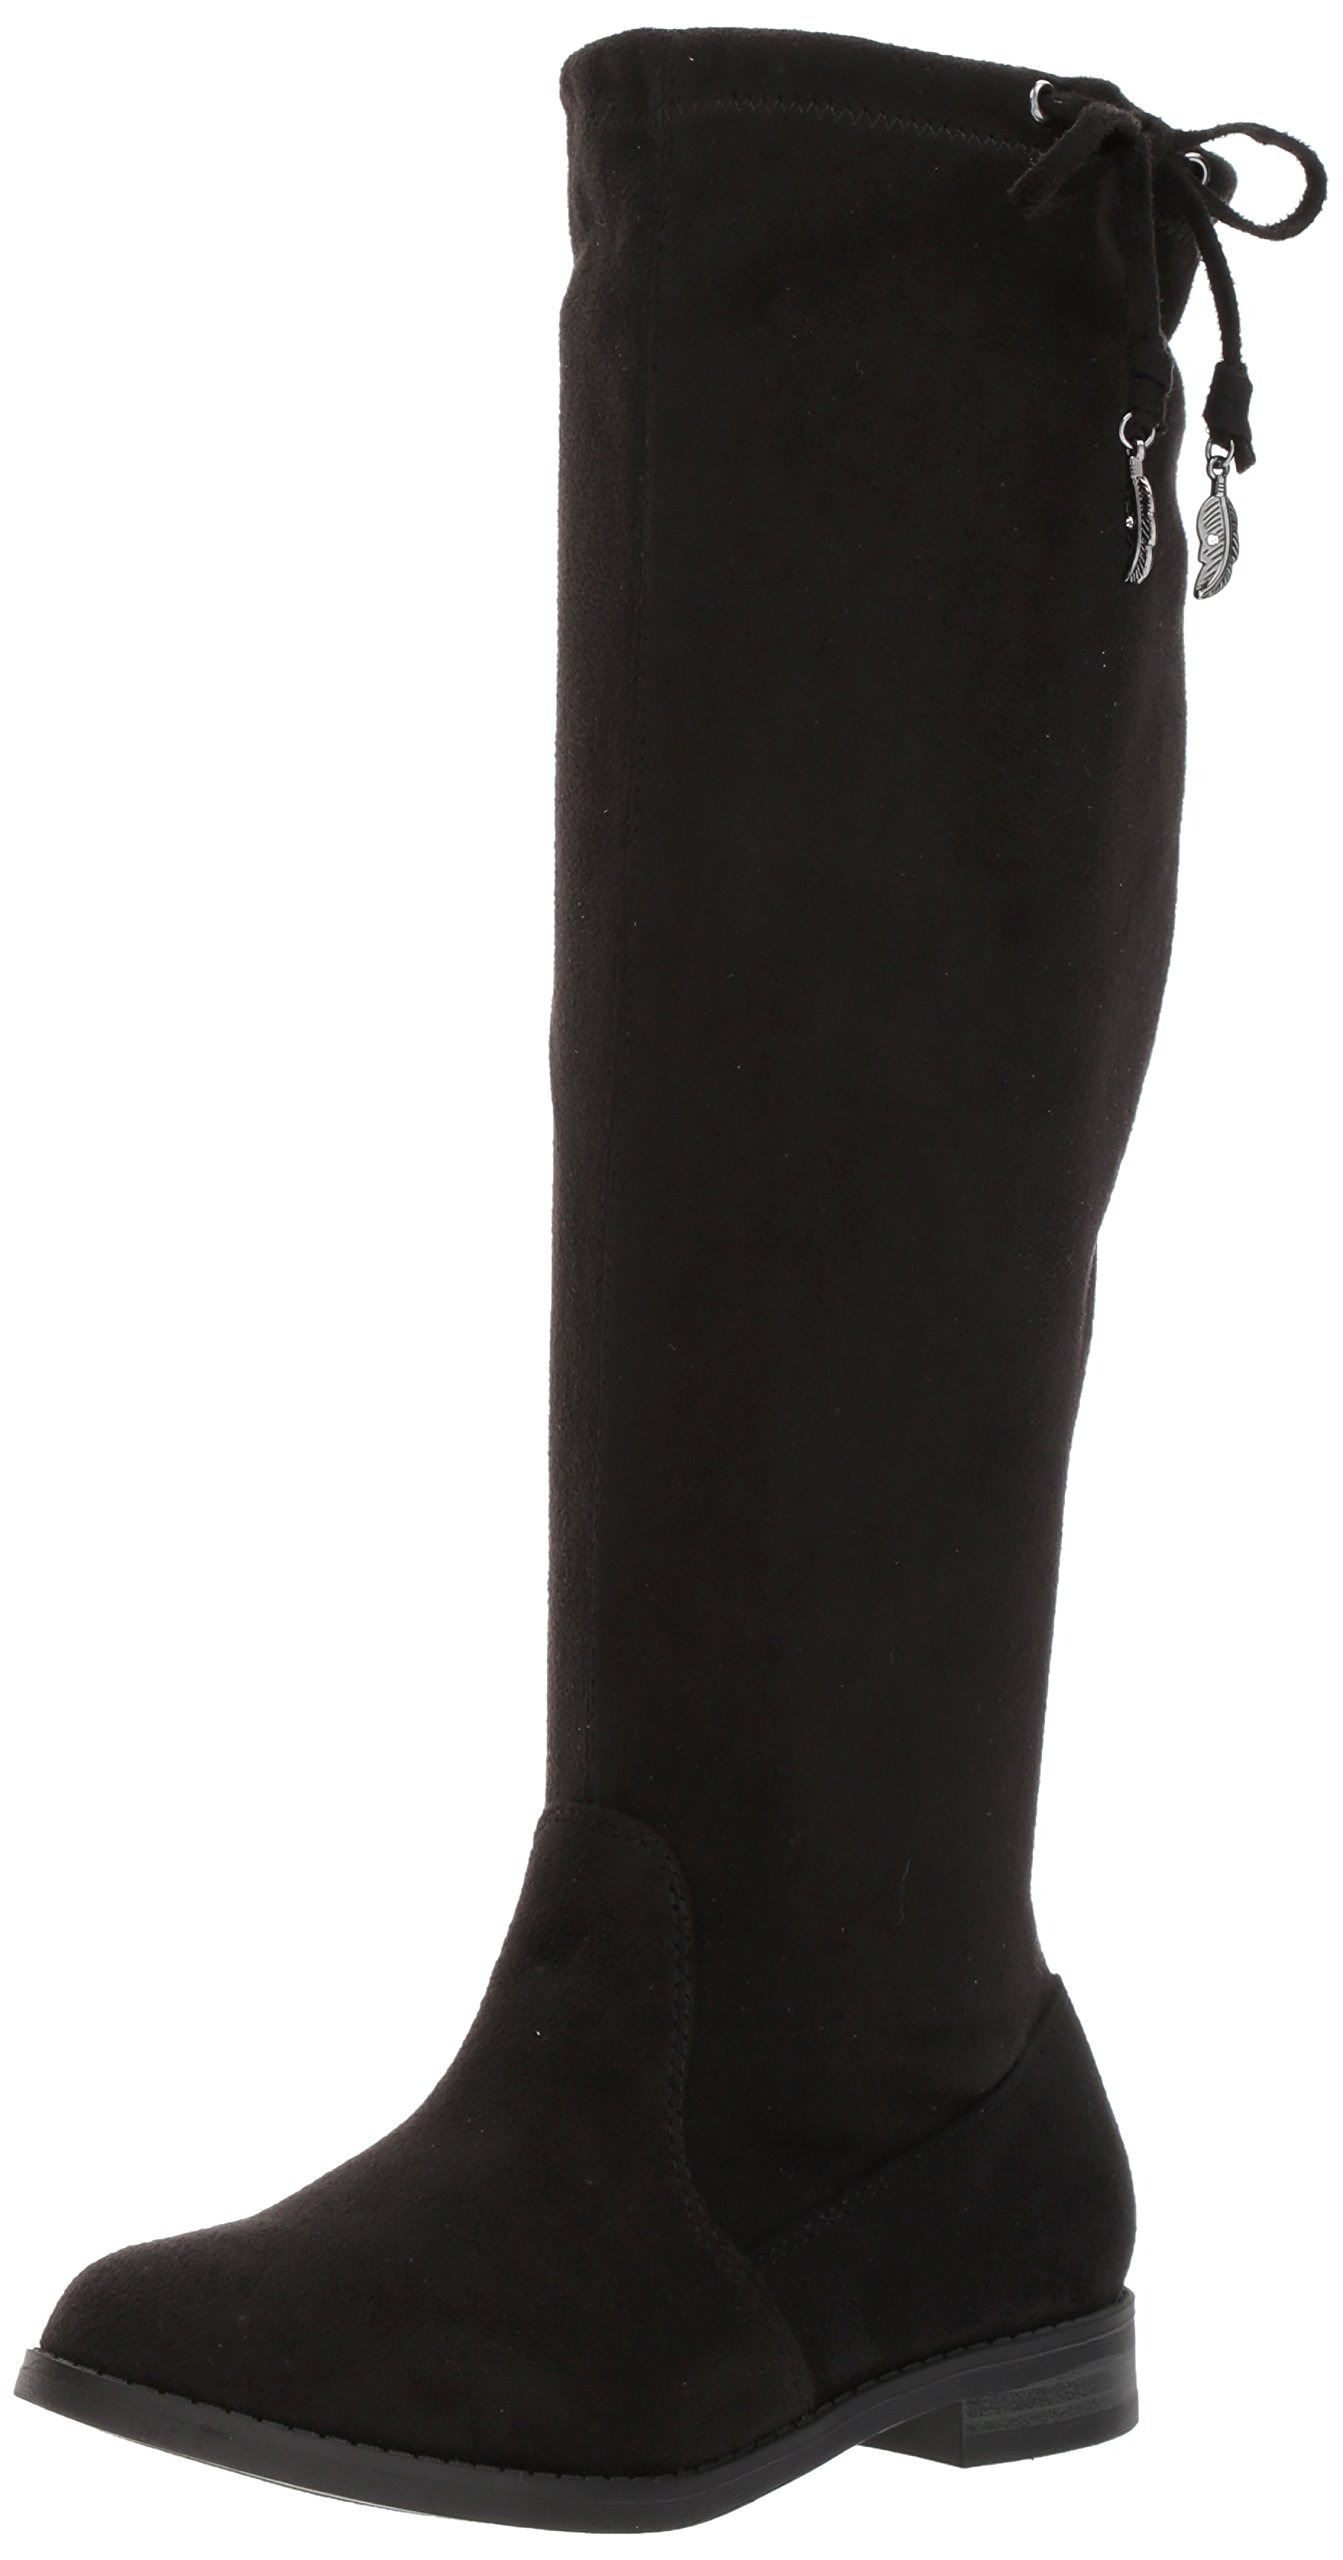 Jessica Simpson Girls' ISSA Slip-on, Black Stretch Microsuede, 4 M US Big Kid